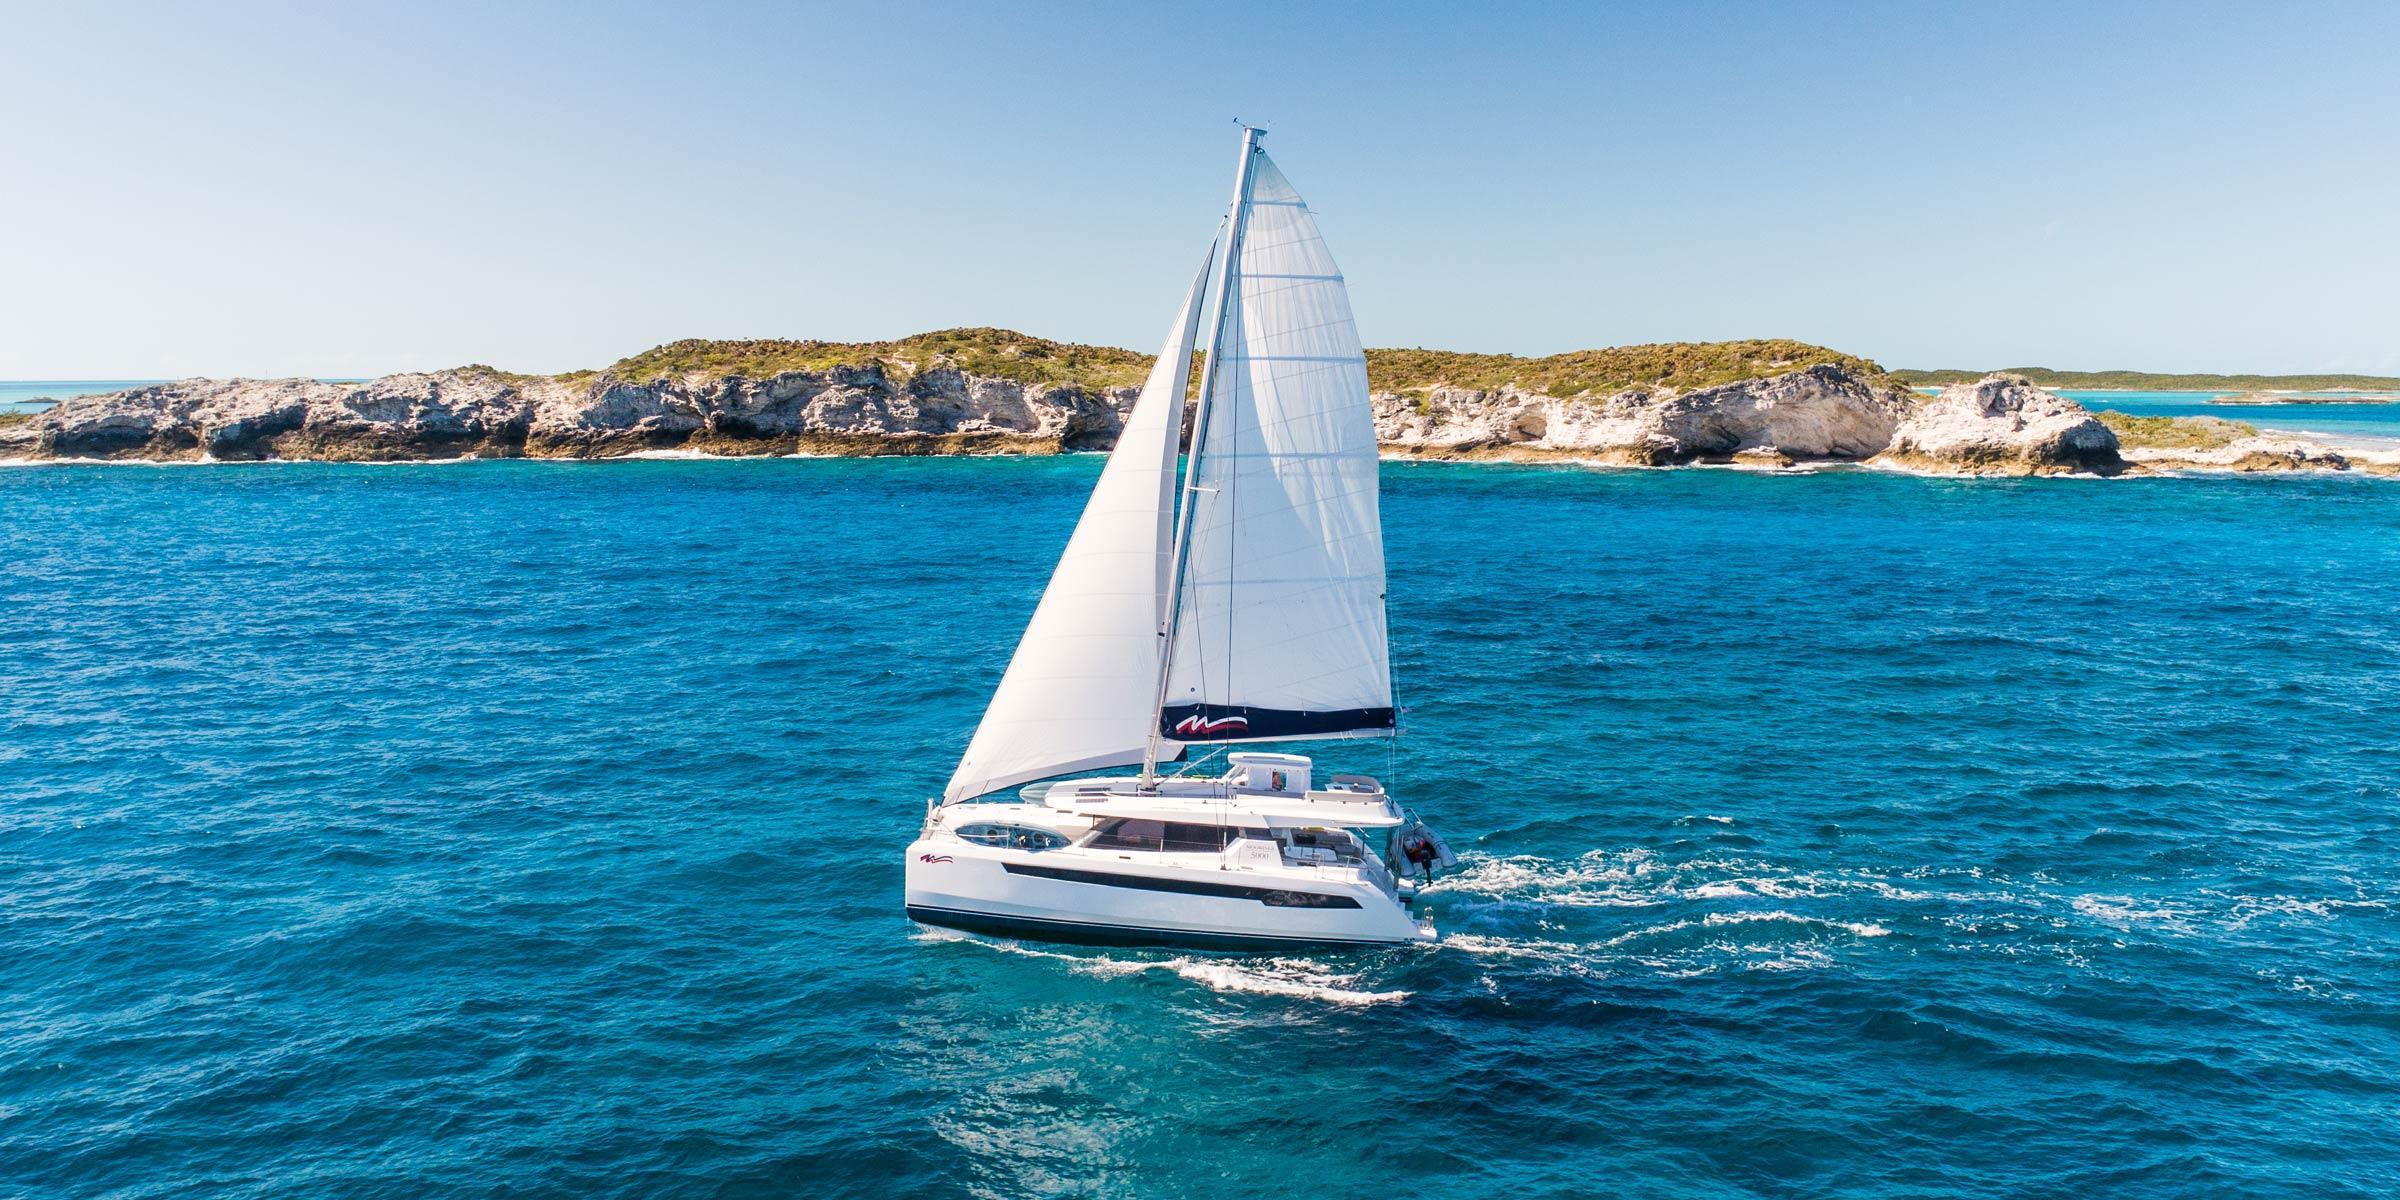 Moorings 5000 sailing in the Exumas, Bahamas